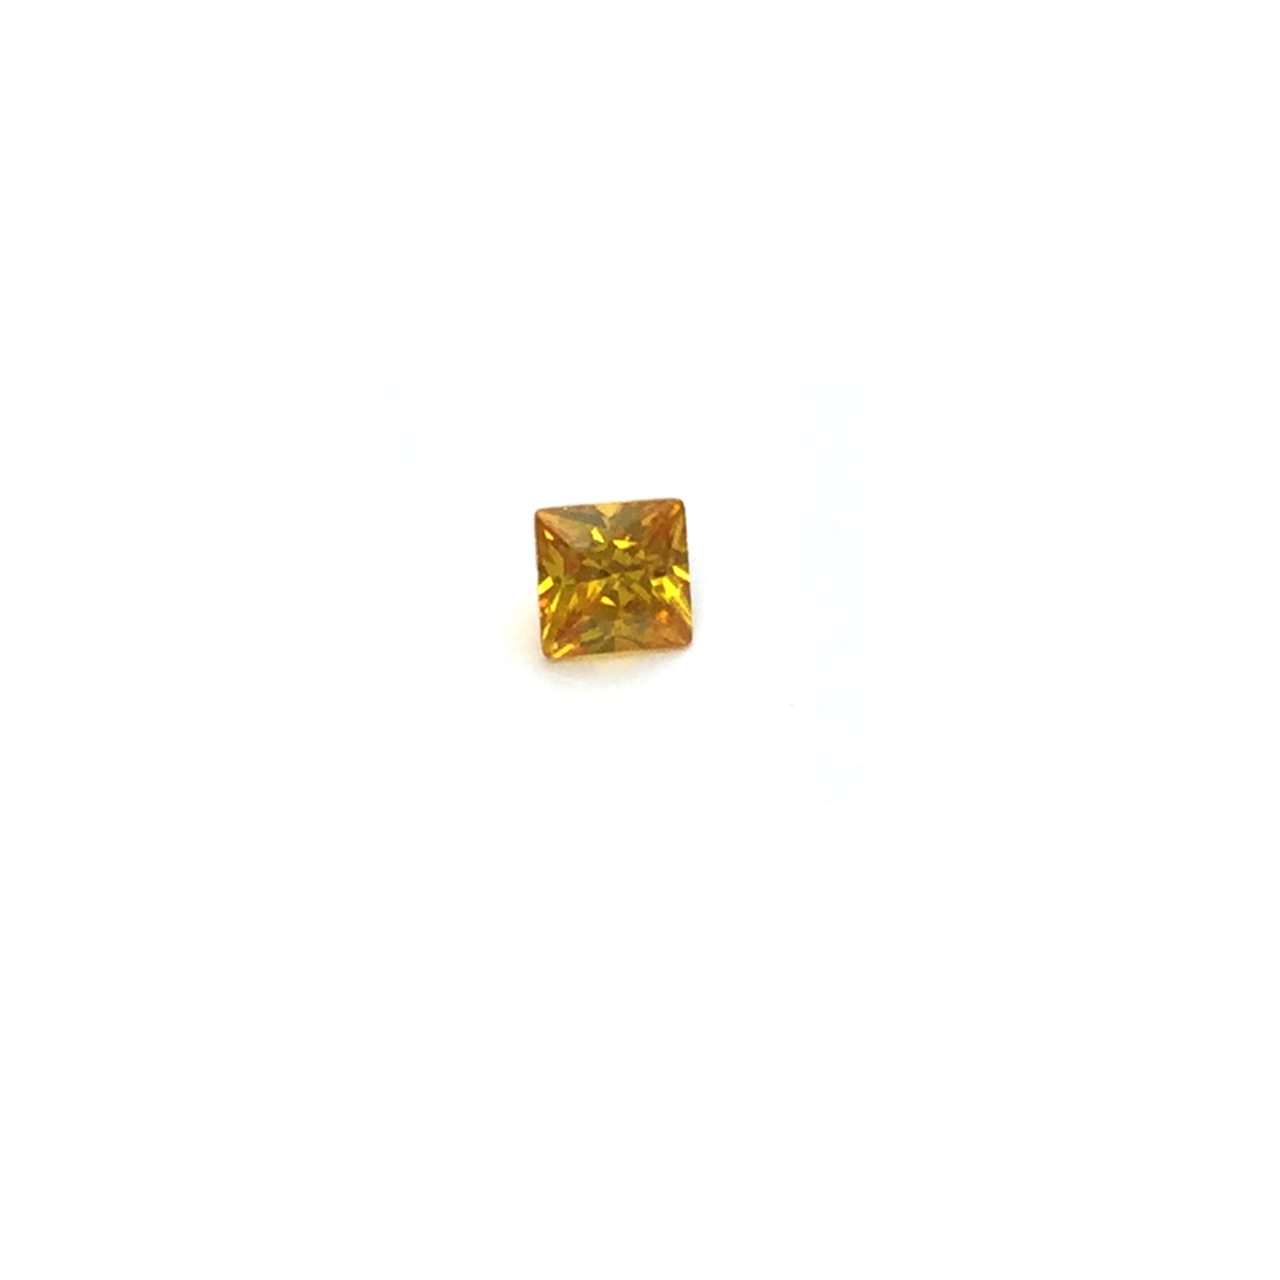 Lab Created Gemstone - Dark Yellow Square